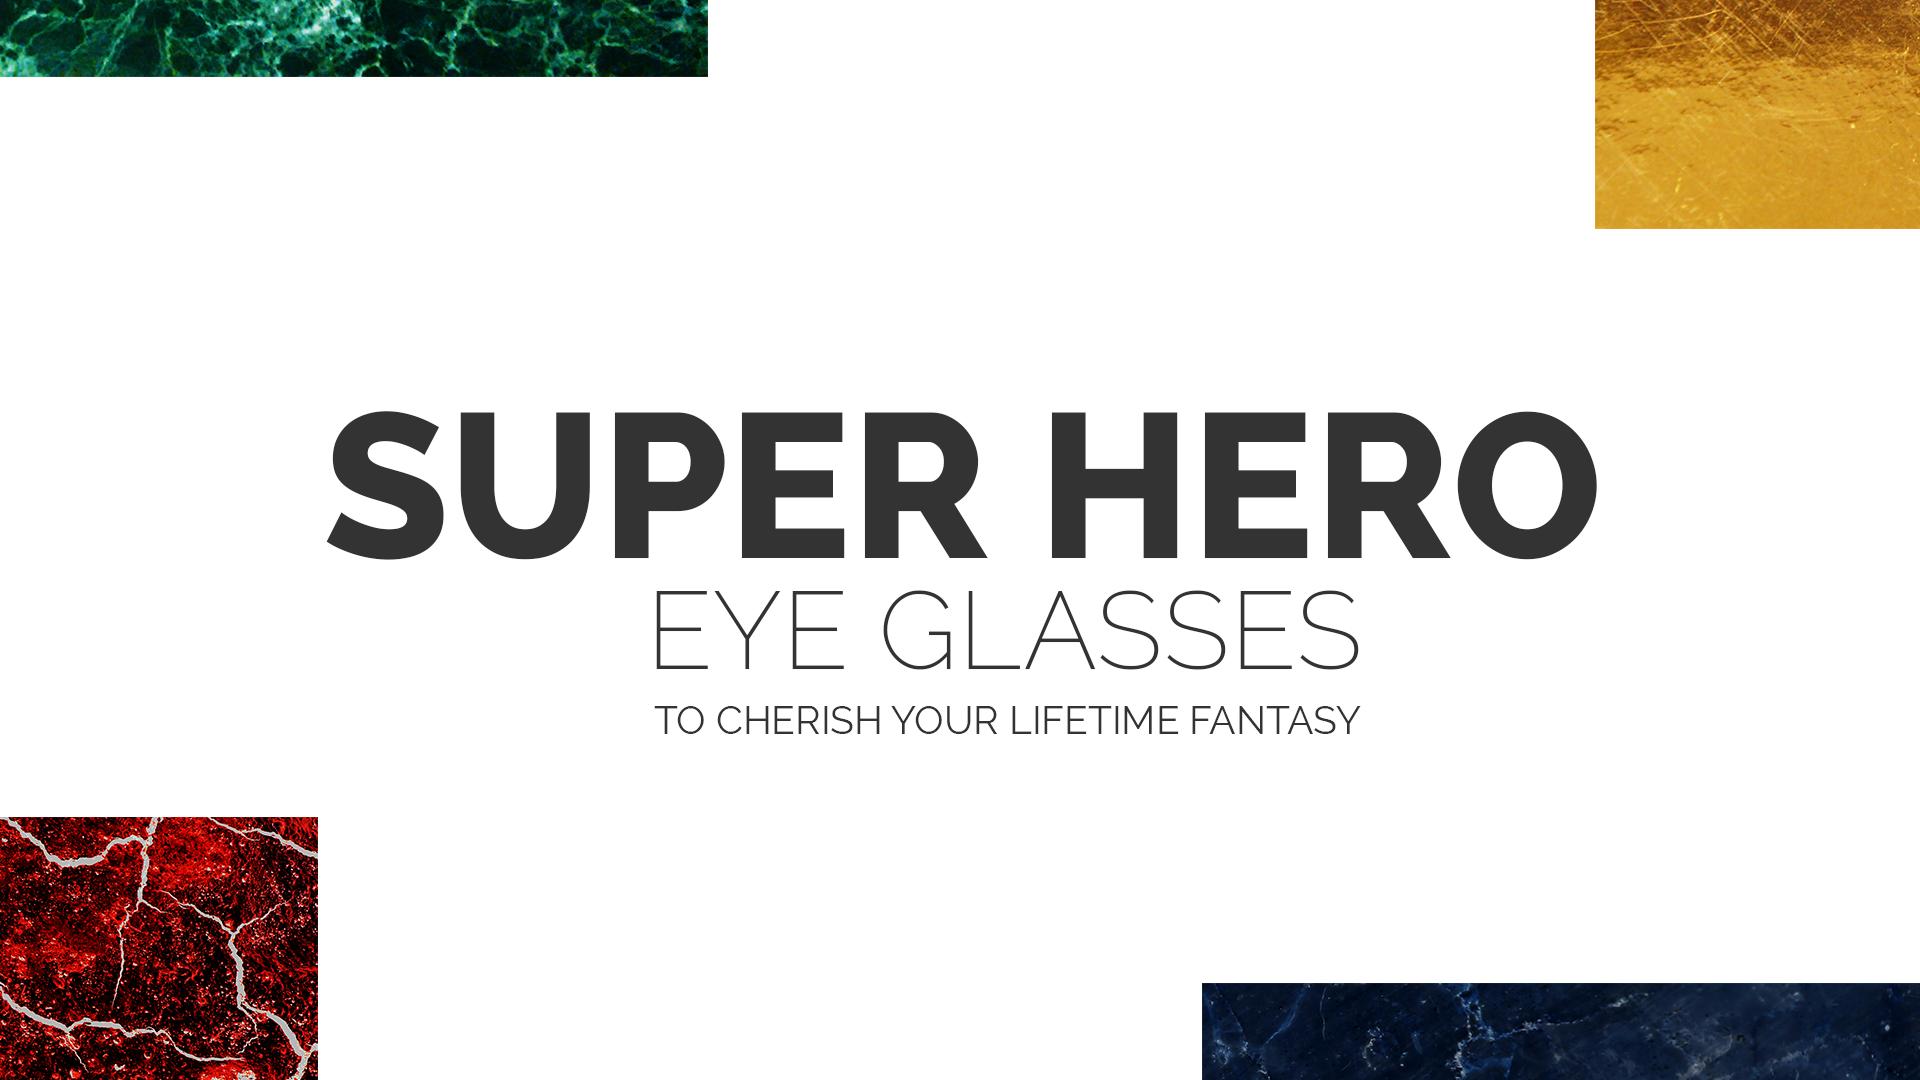 Buy Superhero Frames To Cherish Your Lifetime Fantasy